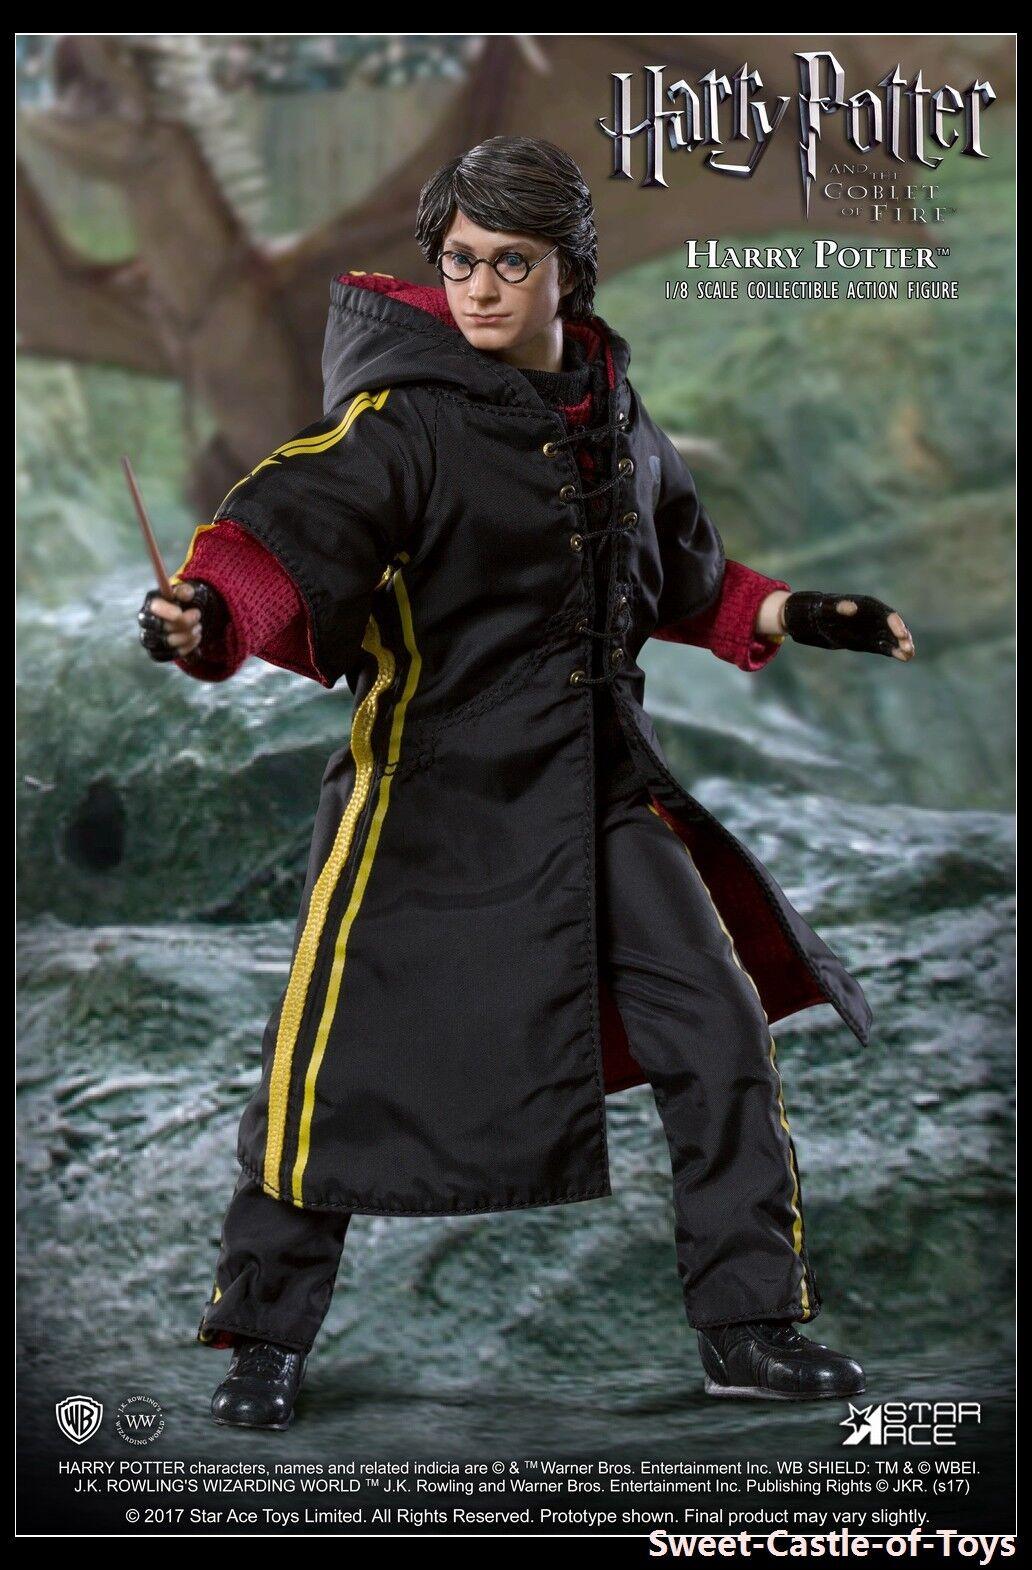 1 8 estrella Ace giocattoli Harry Potter  the Goblet of Fire Tri-Wizard Tournament SA8001A  vendite online